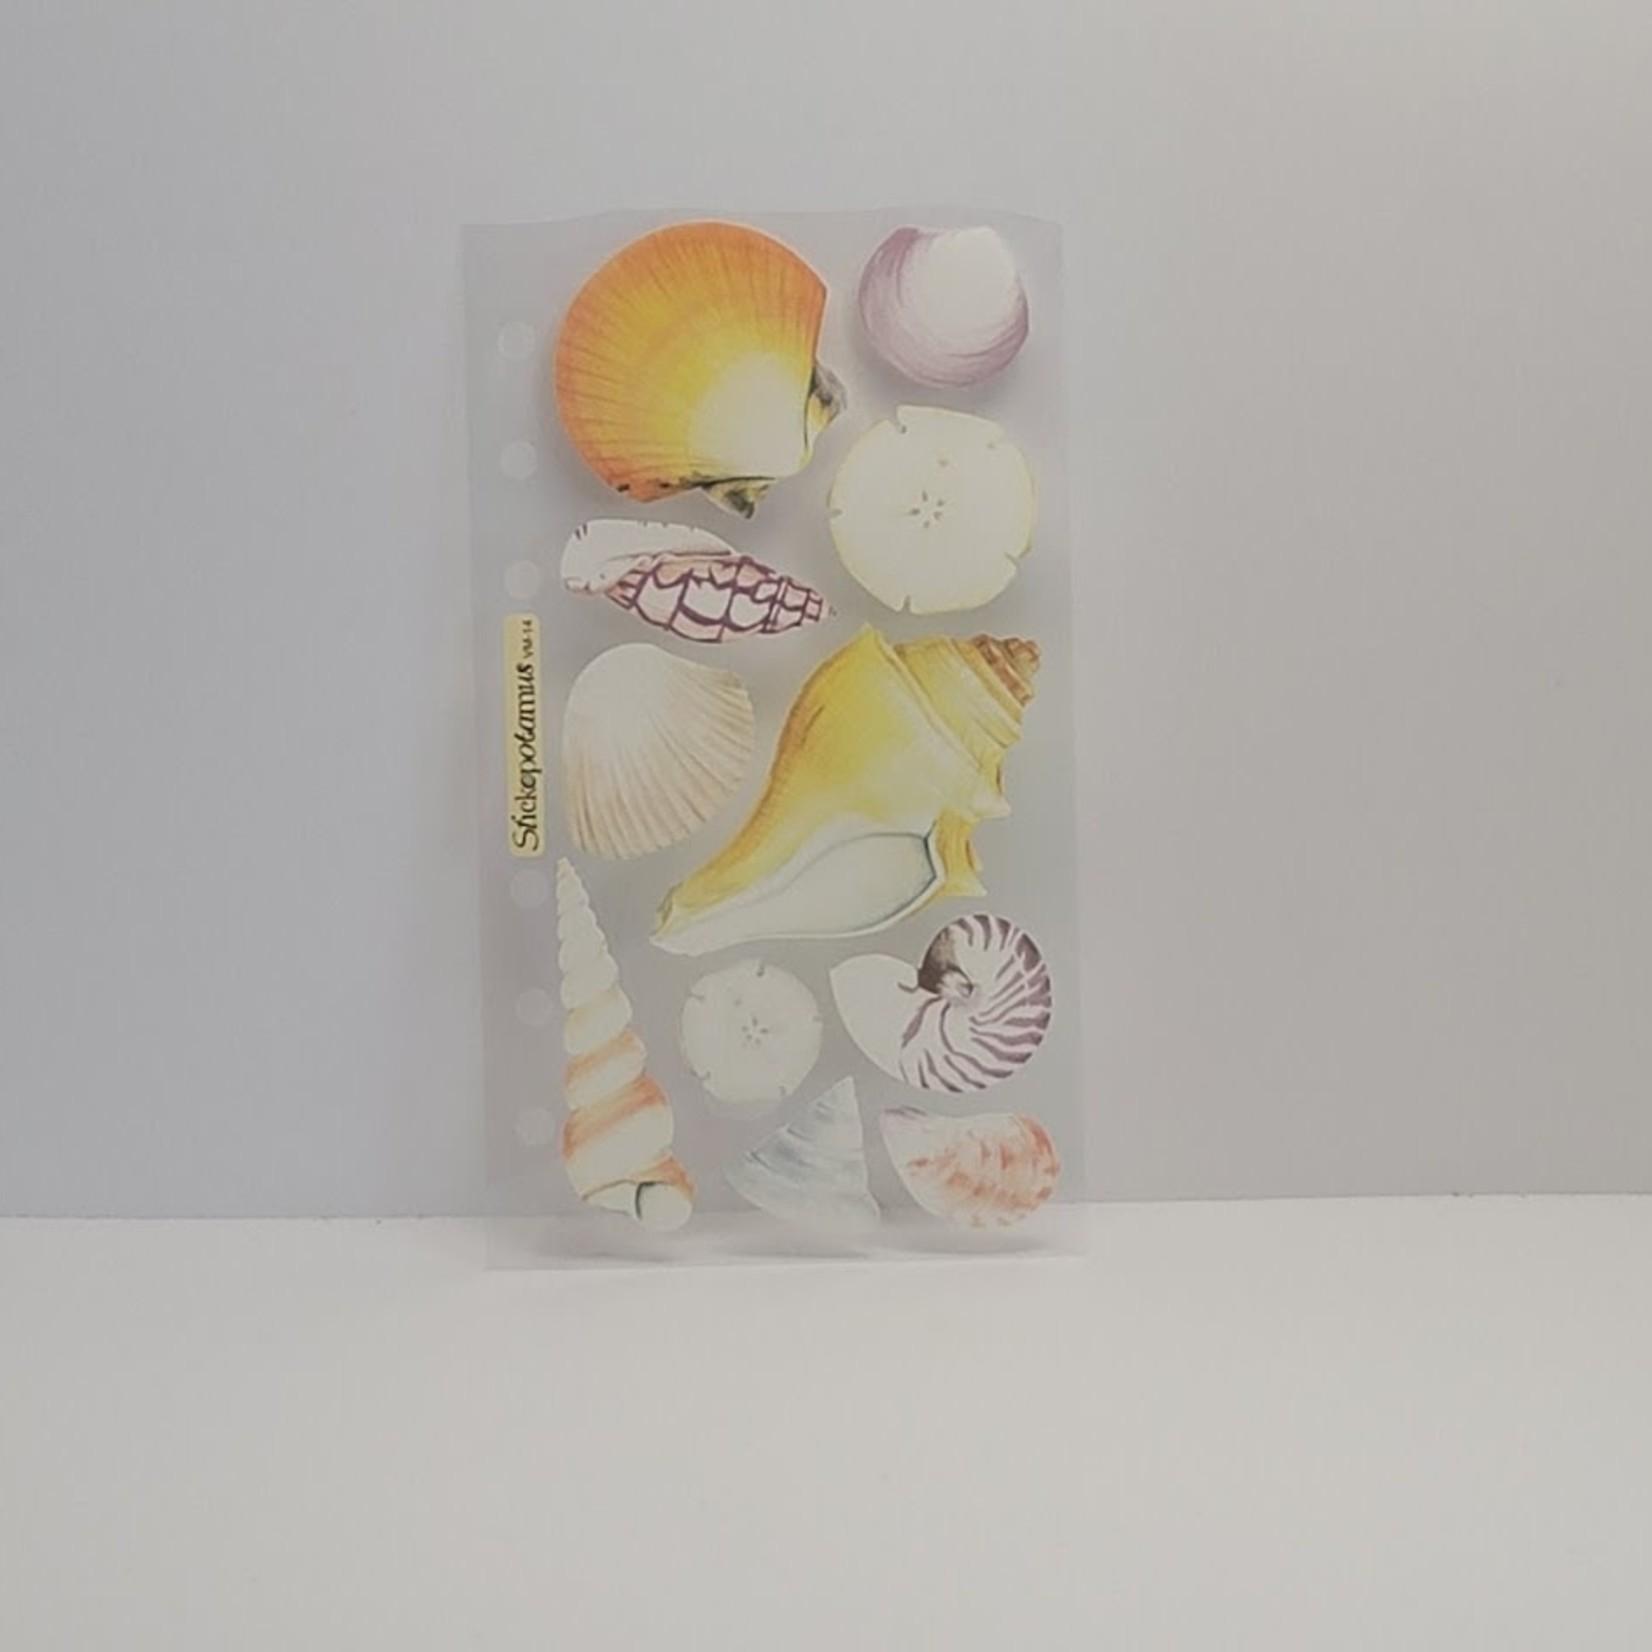 Stickers - Shells